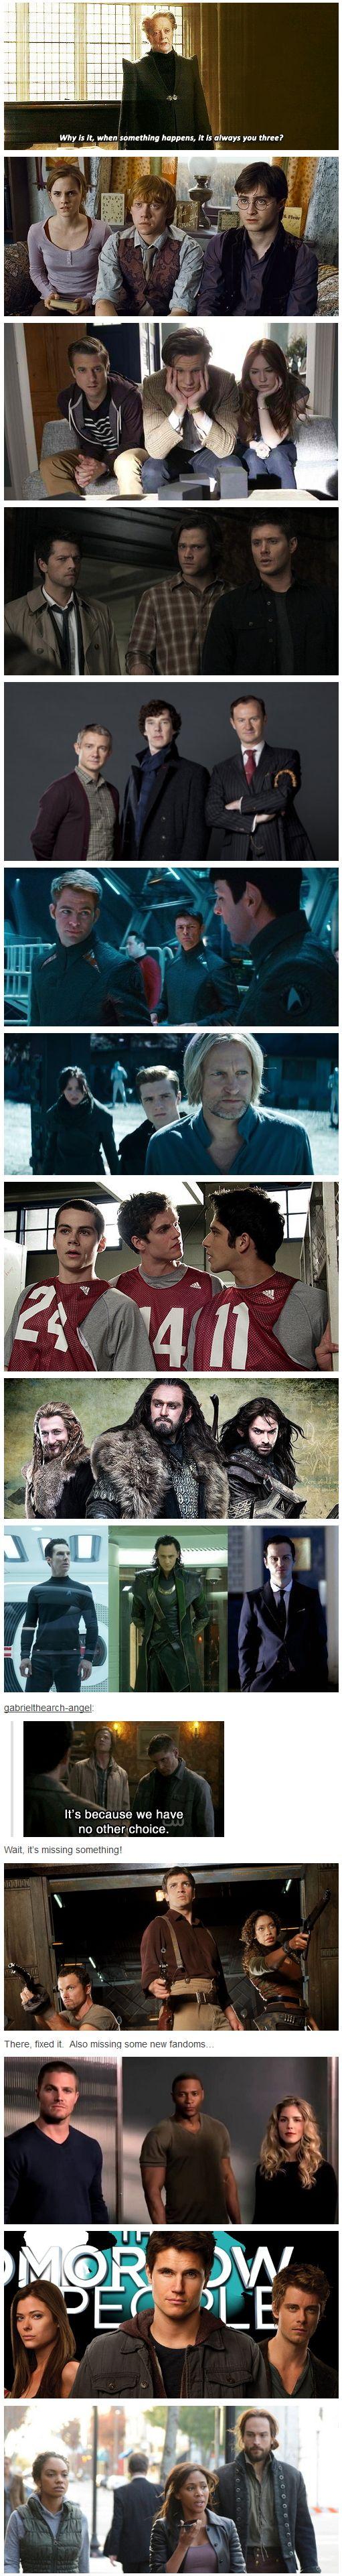 "The ""Power of Three"" Fandoms on Tumblr [gifset] - Harry Potter, Doctor Who, Supernatural, Sherlock, Star Trek, Hunger Games, Teen Wolf, Hobbit, Villians {Khan, Loki, Moriarty), Firefly, Arrow, The Tomorrow People, Sleepy Hollow."